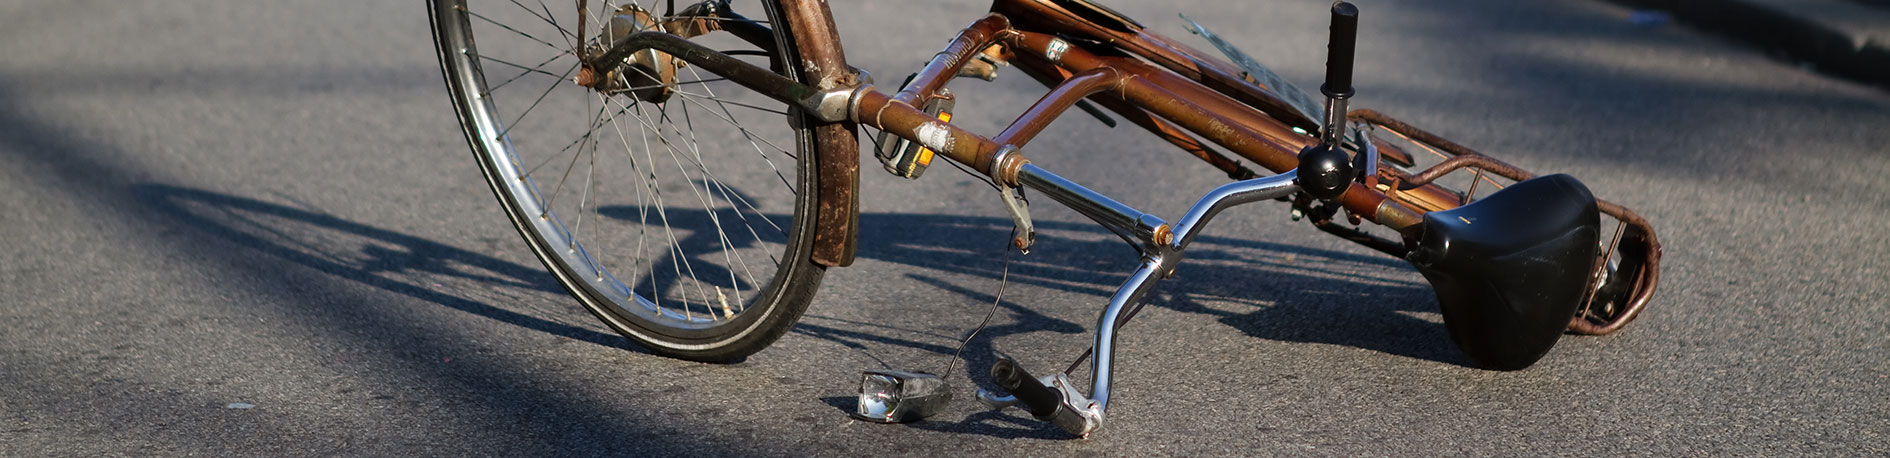 Vaker ernstig letsel op e-bike | LetselPro